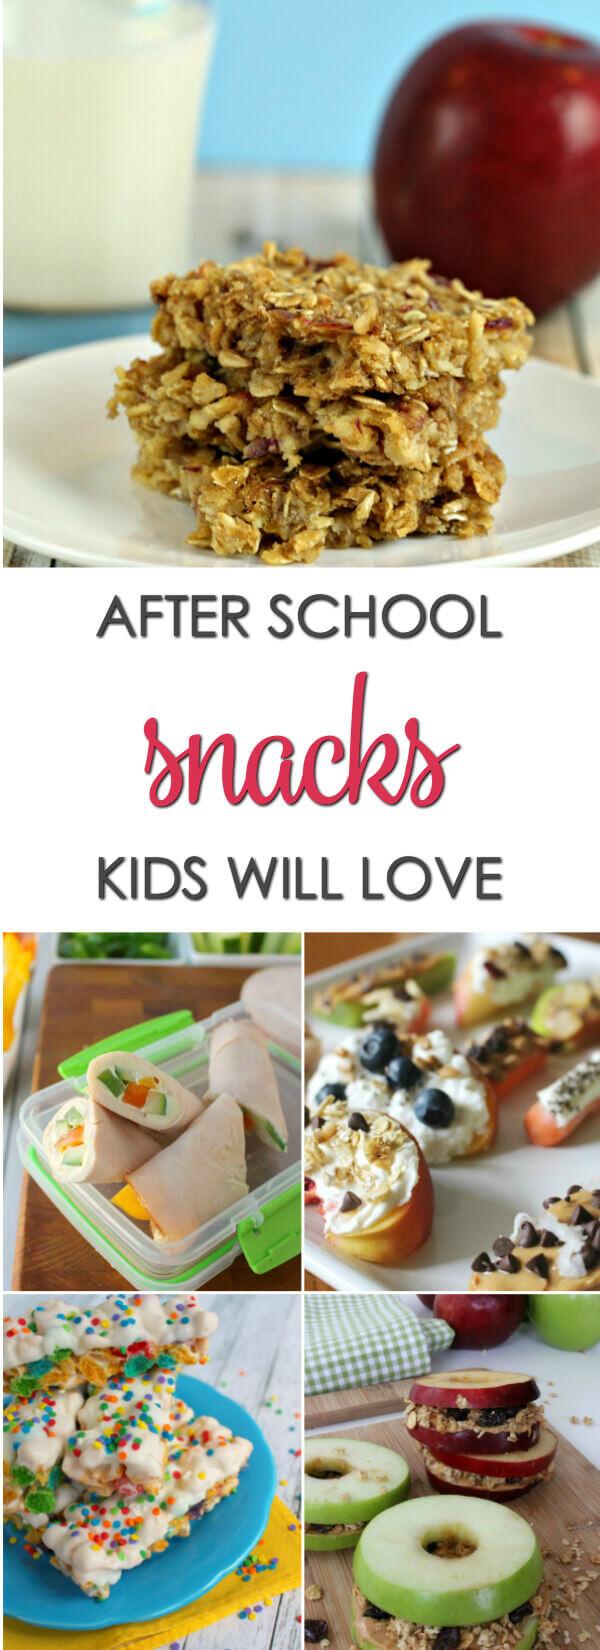 20 After School Snack Ideas Kids Will Love